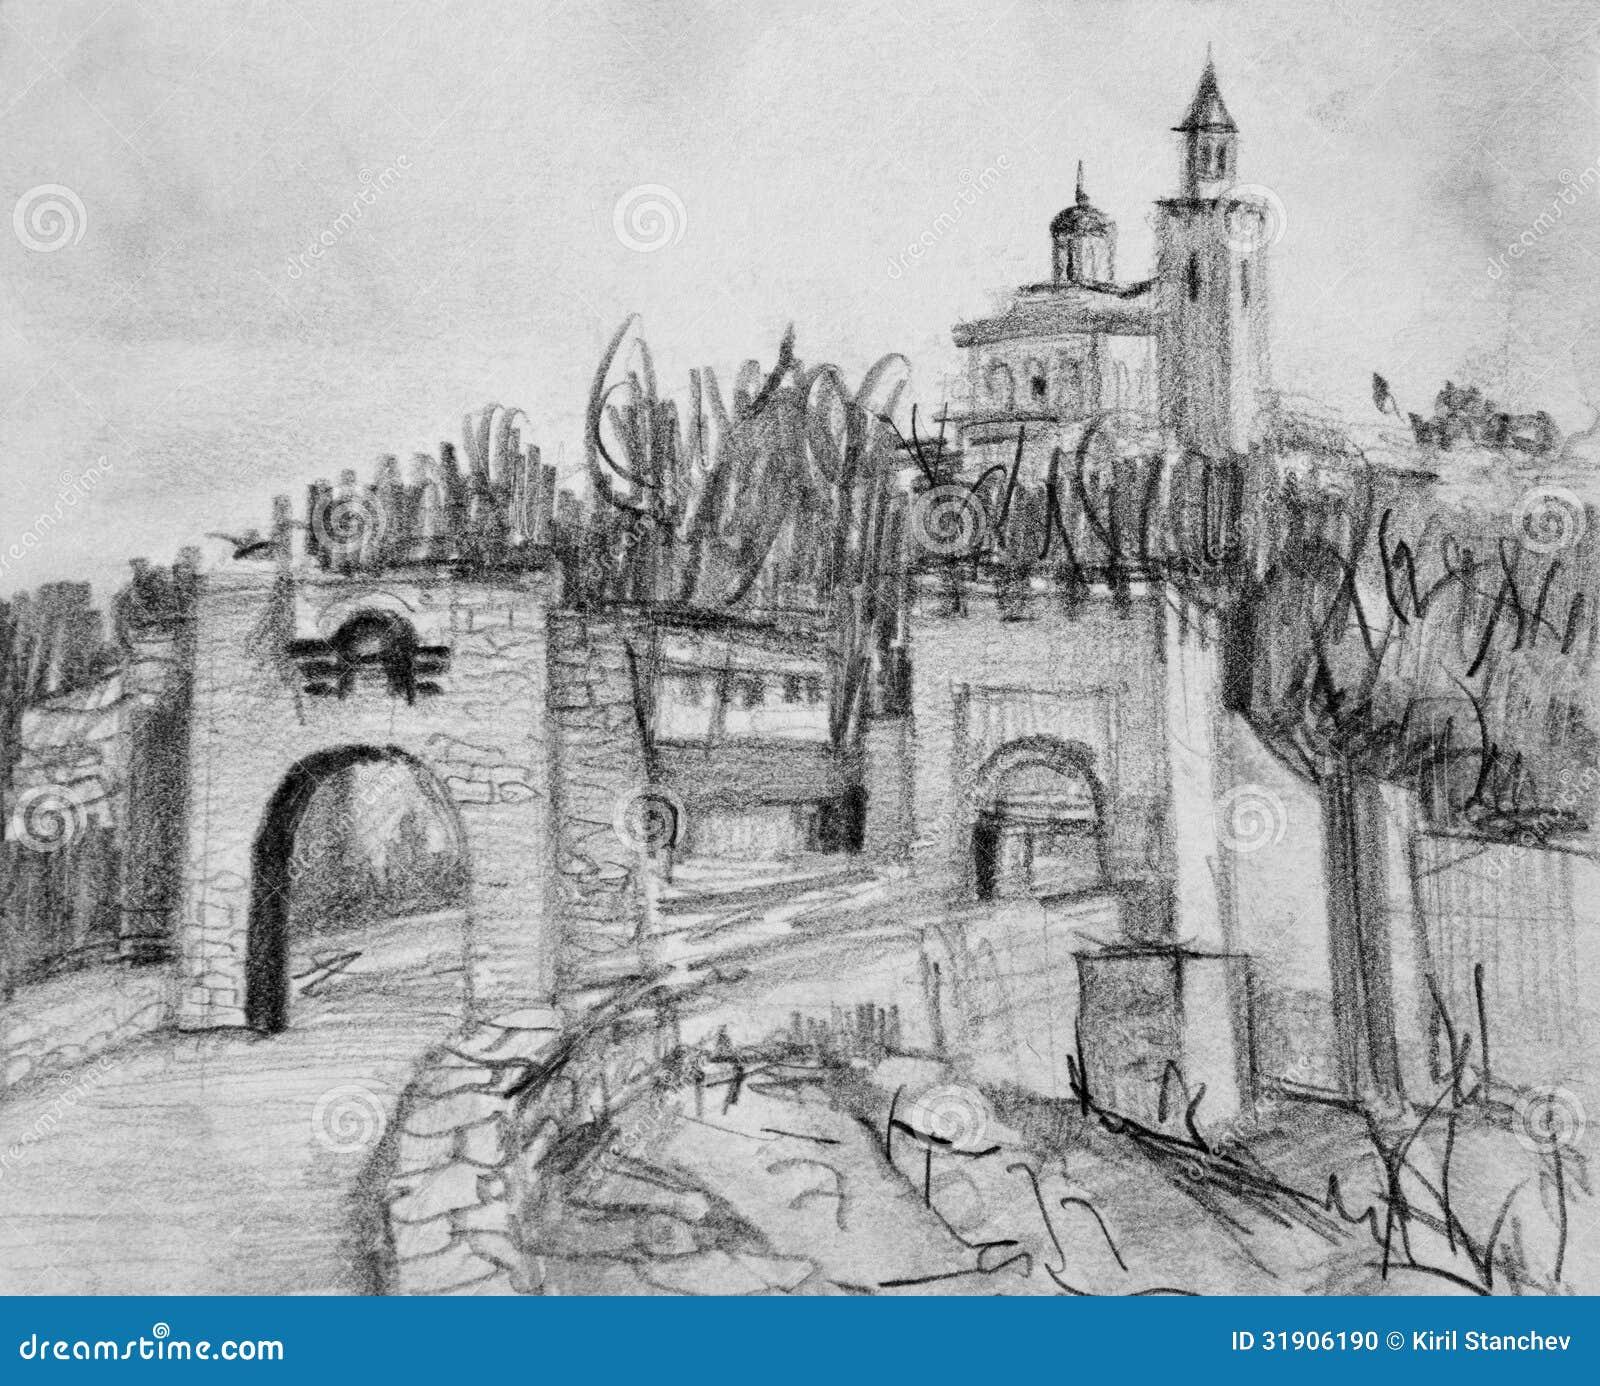 Pencil Drawing Of Fortress Tsarevets In Veliko Tarnovo